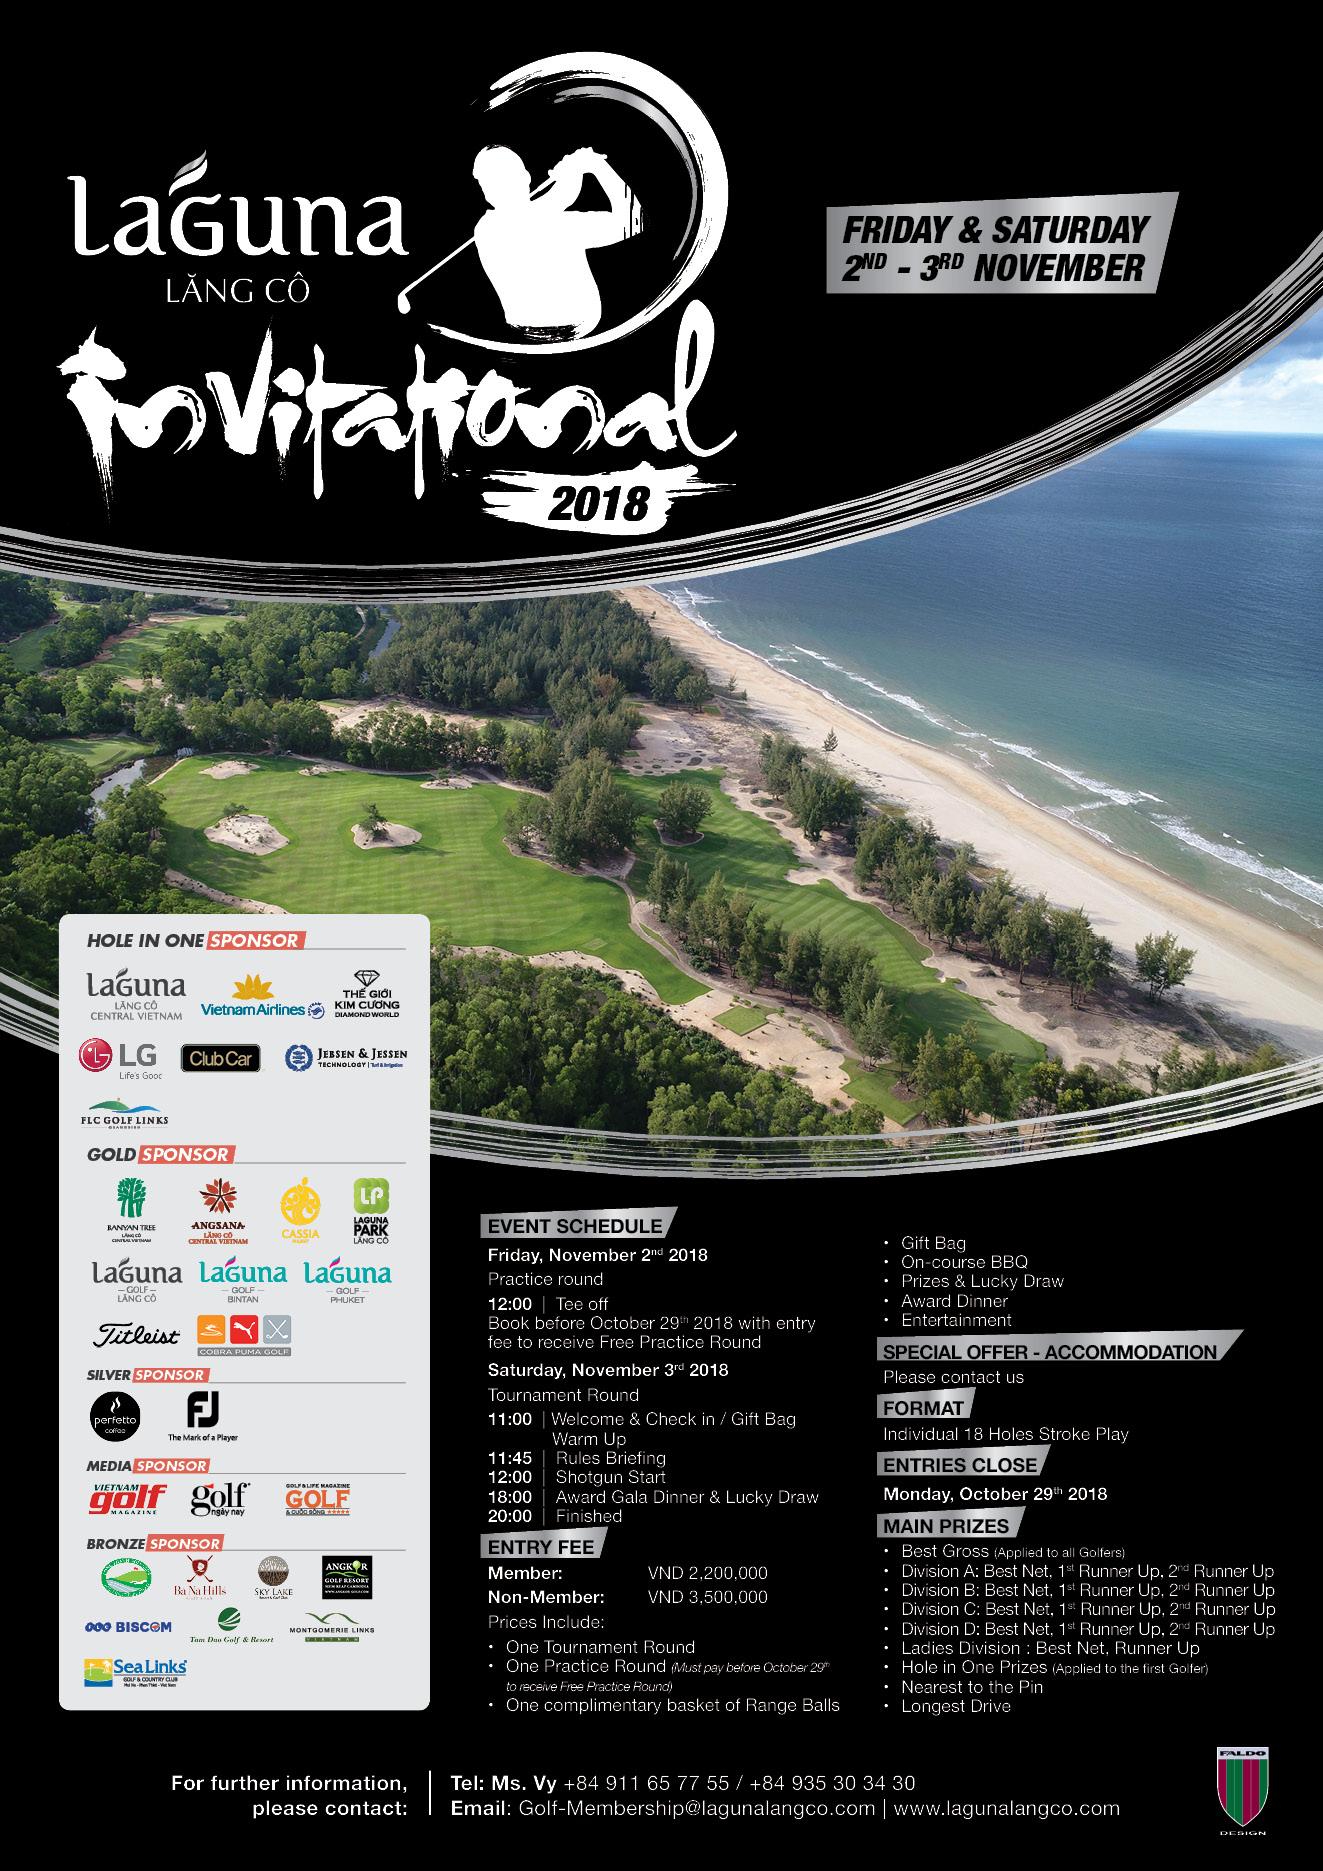 Laguna Lang Co Invitational 2018 tournament poster